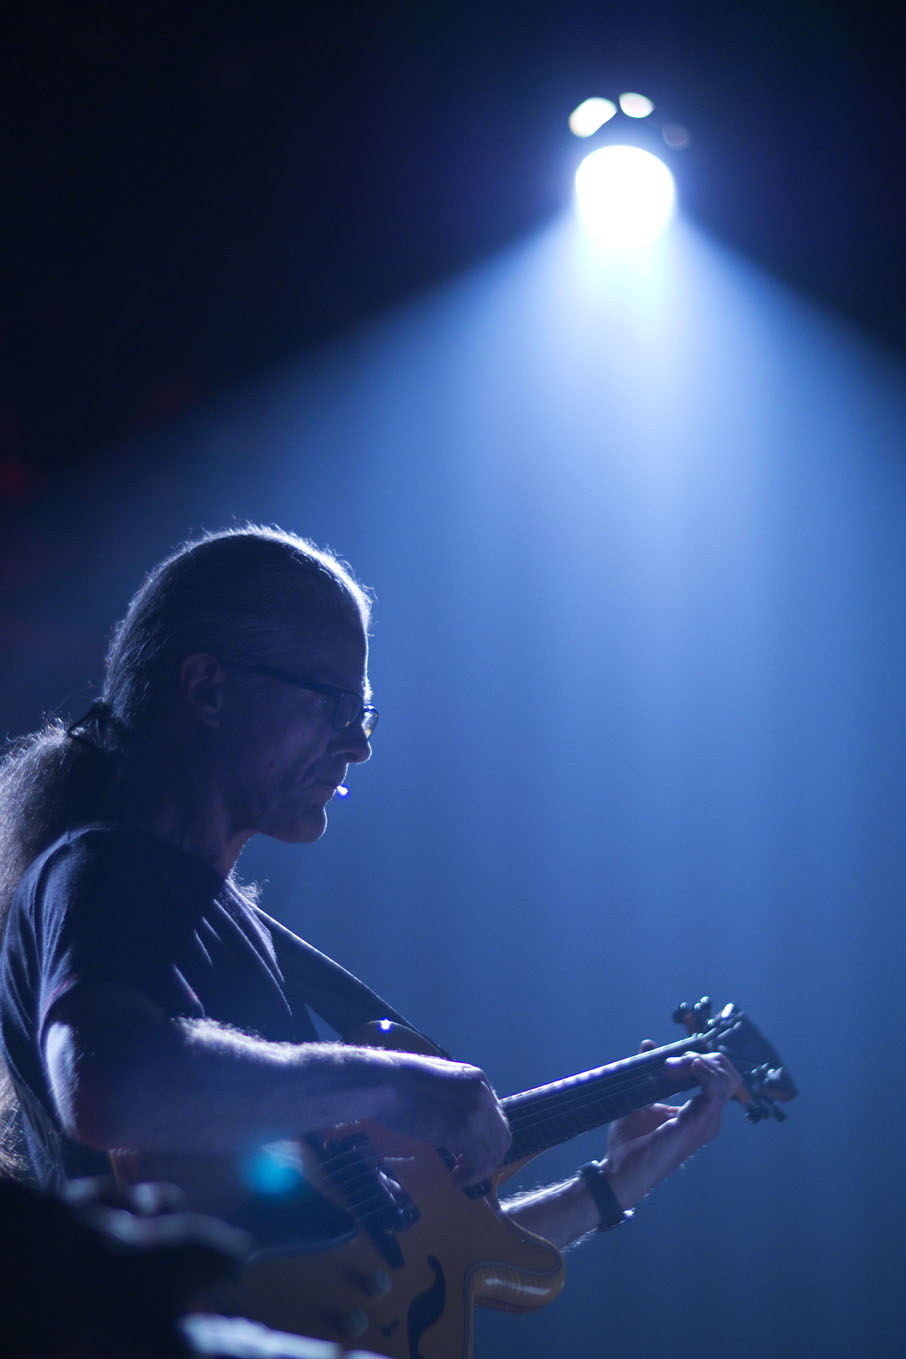 Sylvain Provost